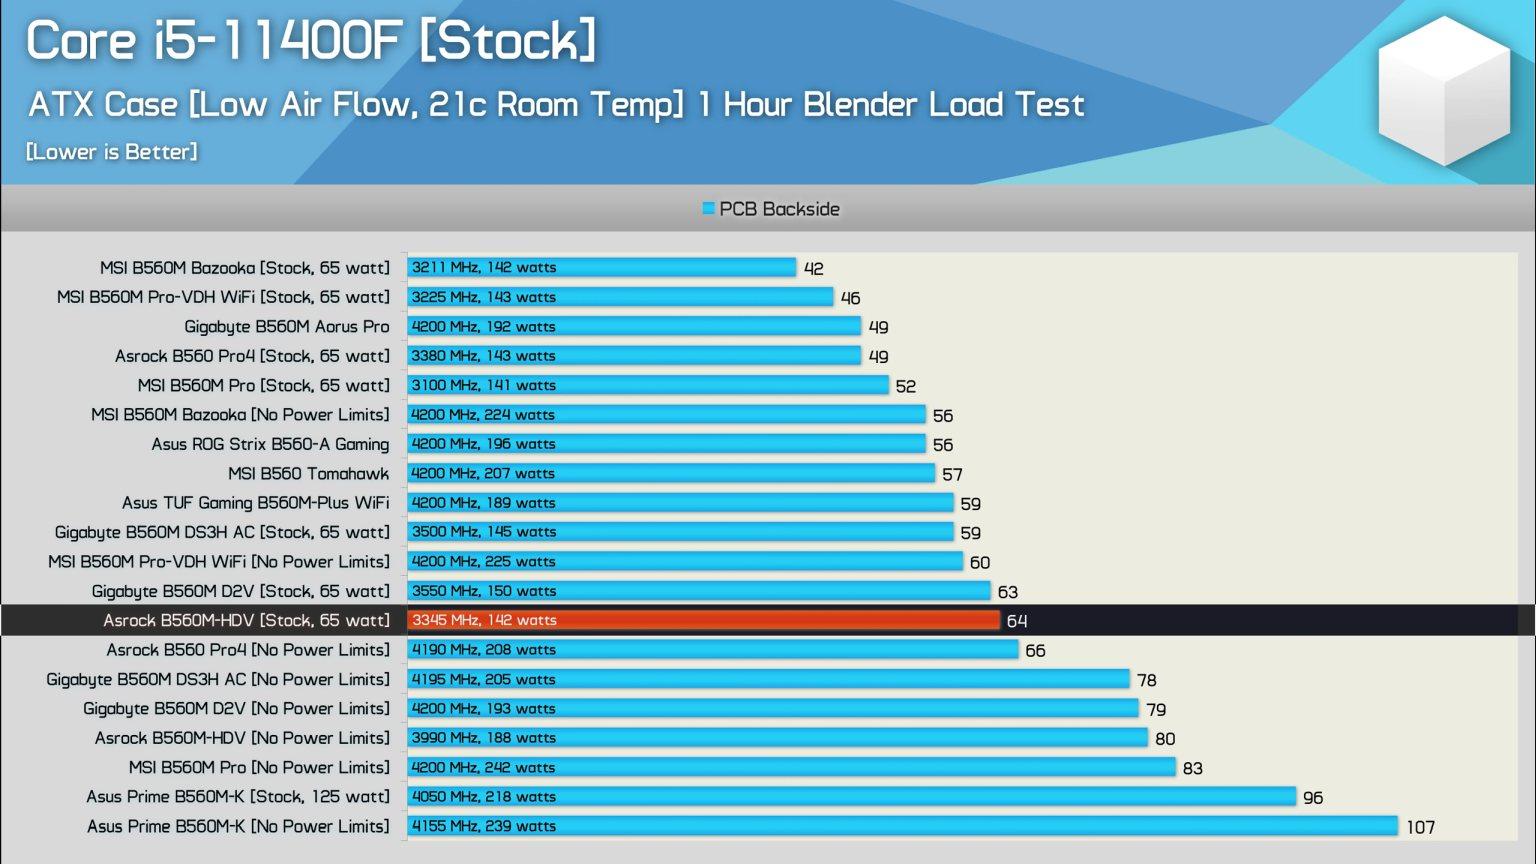 Core i5 11400f ATX Case Benchmark